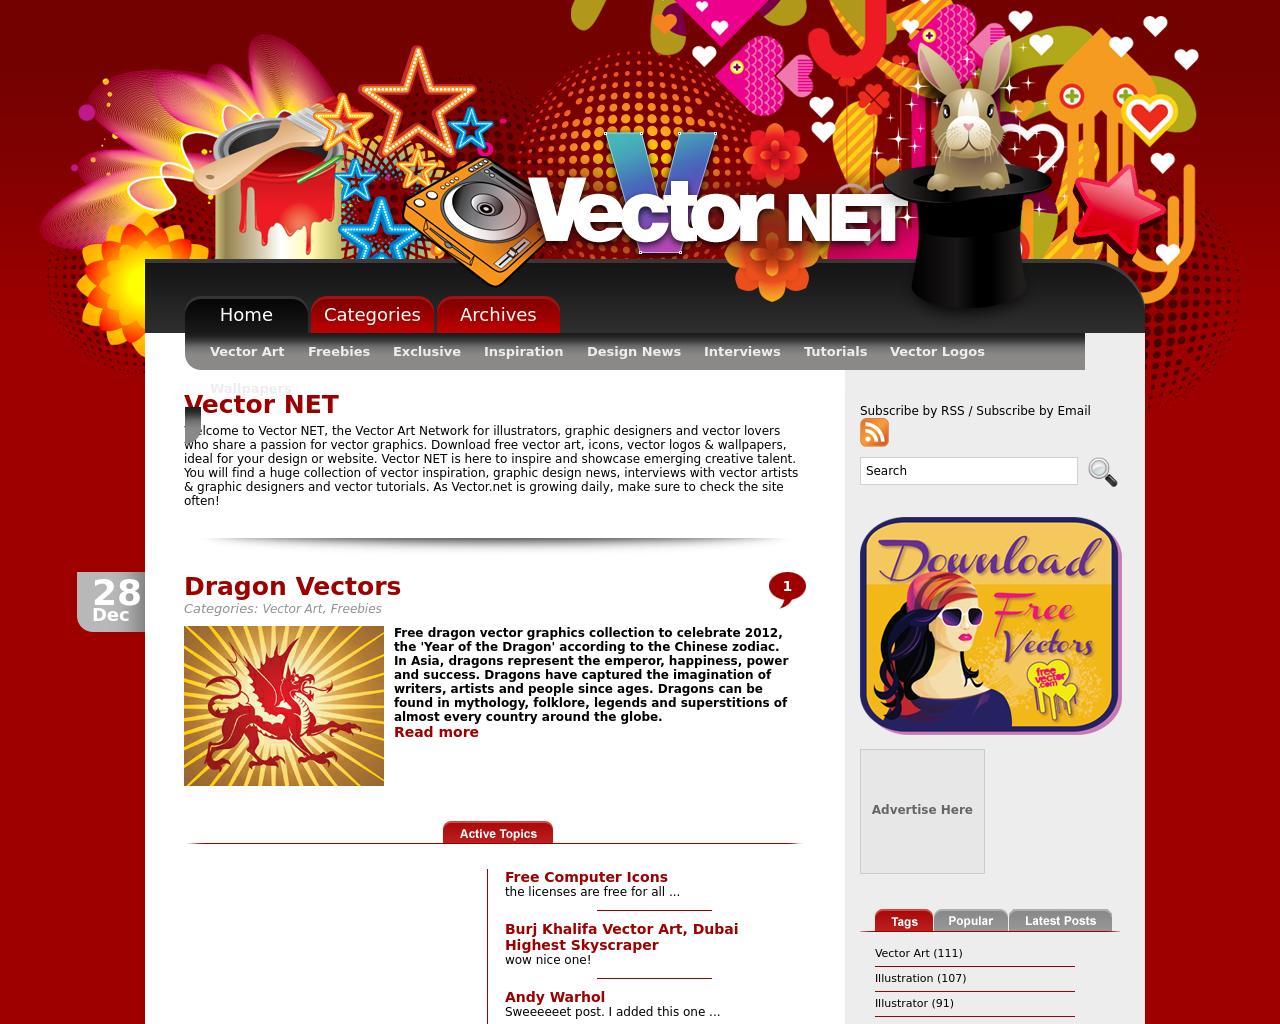 Vectors1-Advertising-Reviews-Pricing